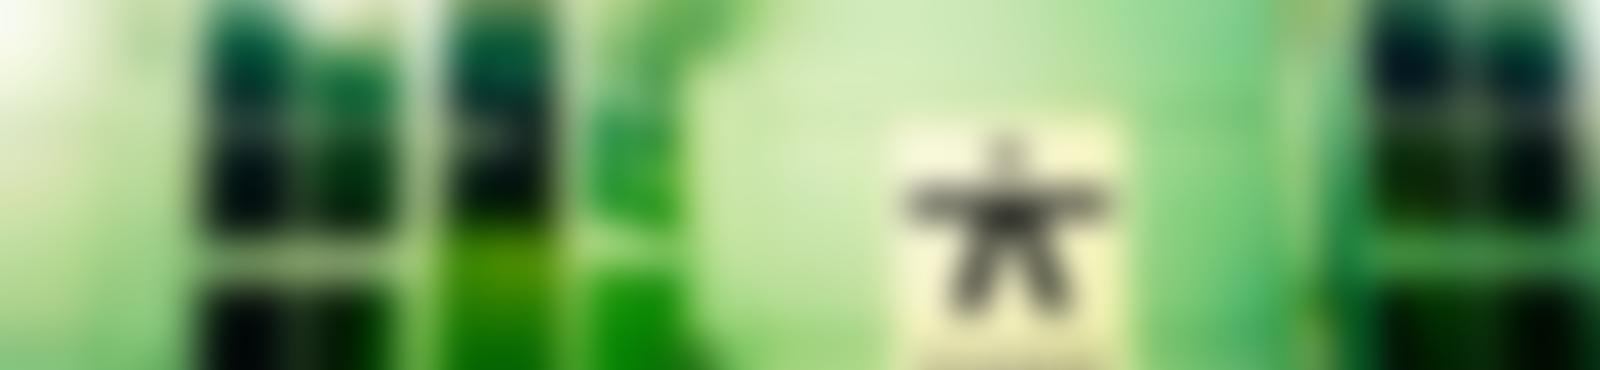 Blurred 90ddb564 38e1 4c4c a3b0 247baf2d7ebe